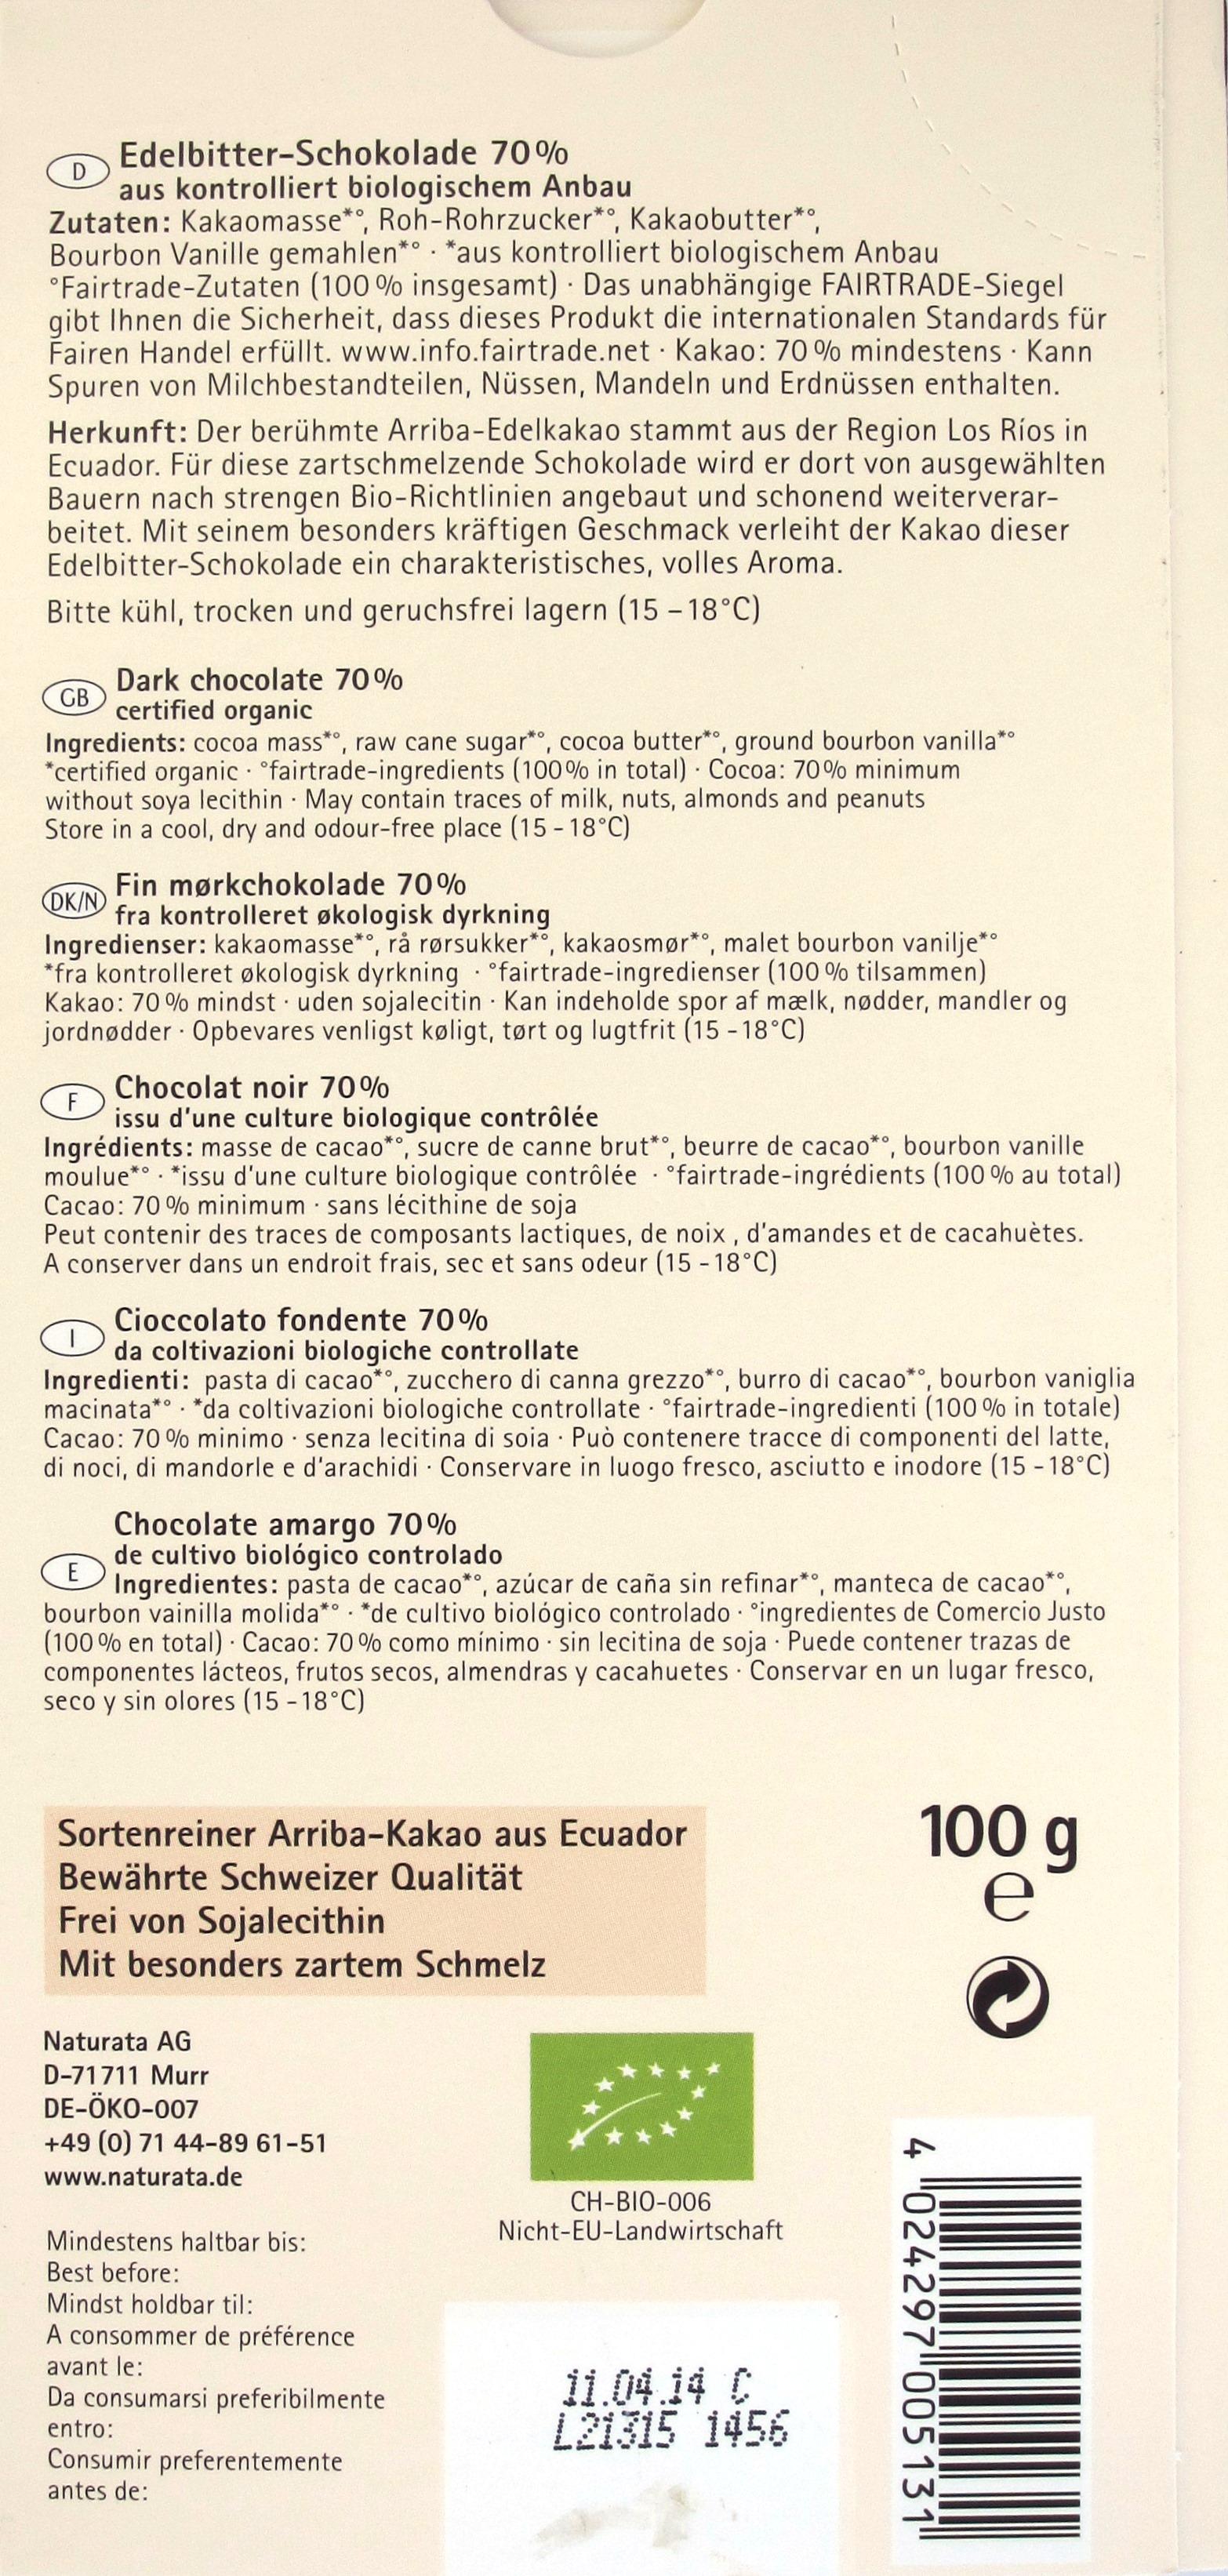 Naturata Ecador Edelbitter 70% Schokolade, Rückseite